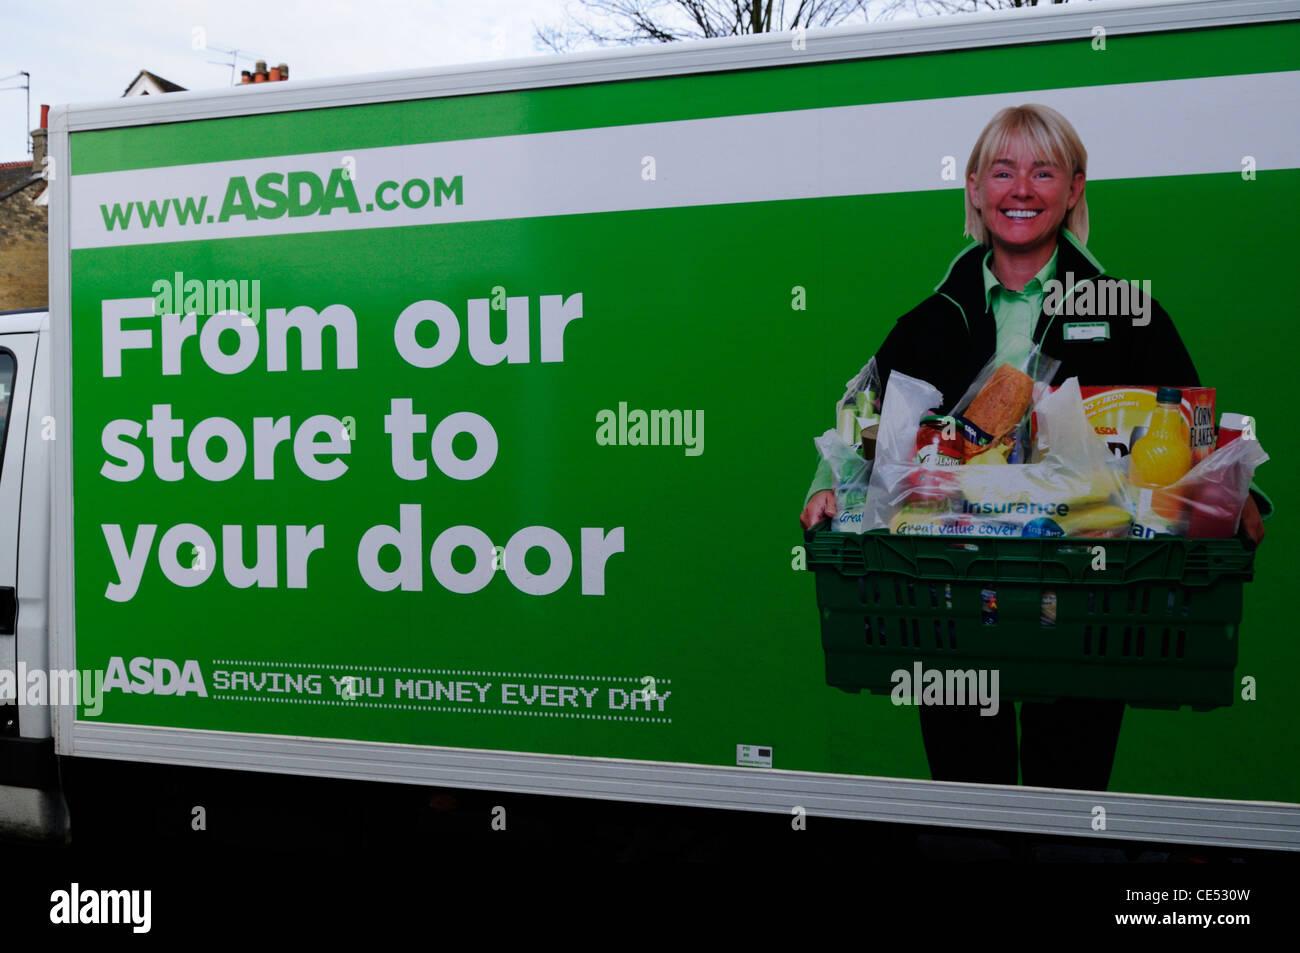 Asda Supermarket Shopping Home Delivery Van, Cambridge, England, UK - Stock Image